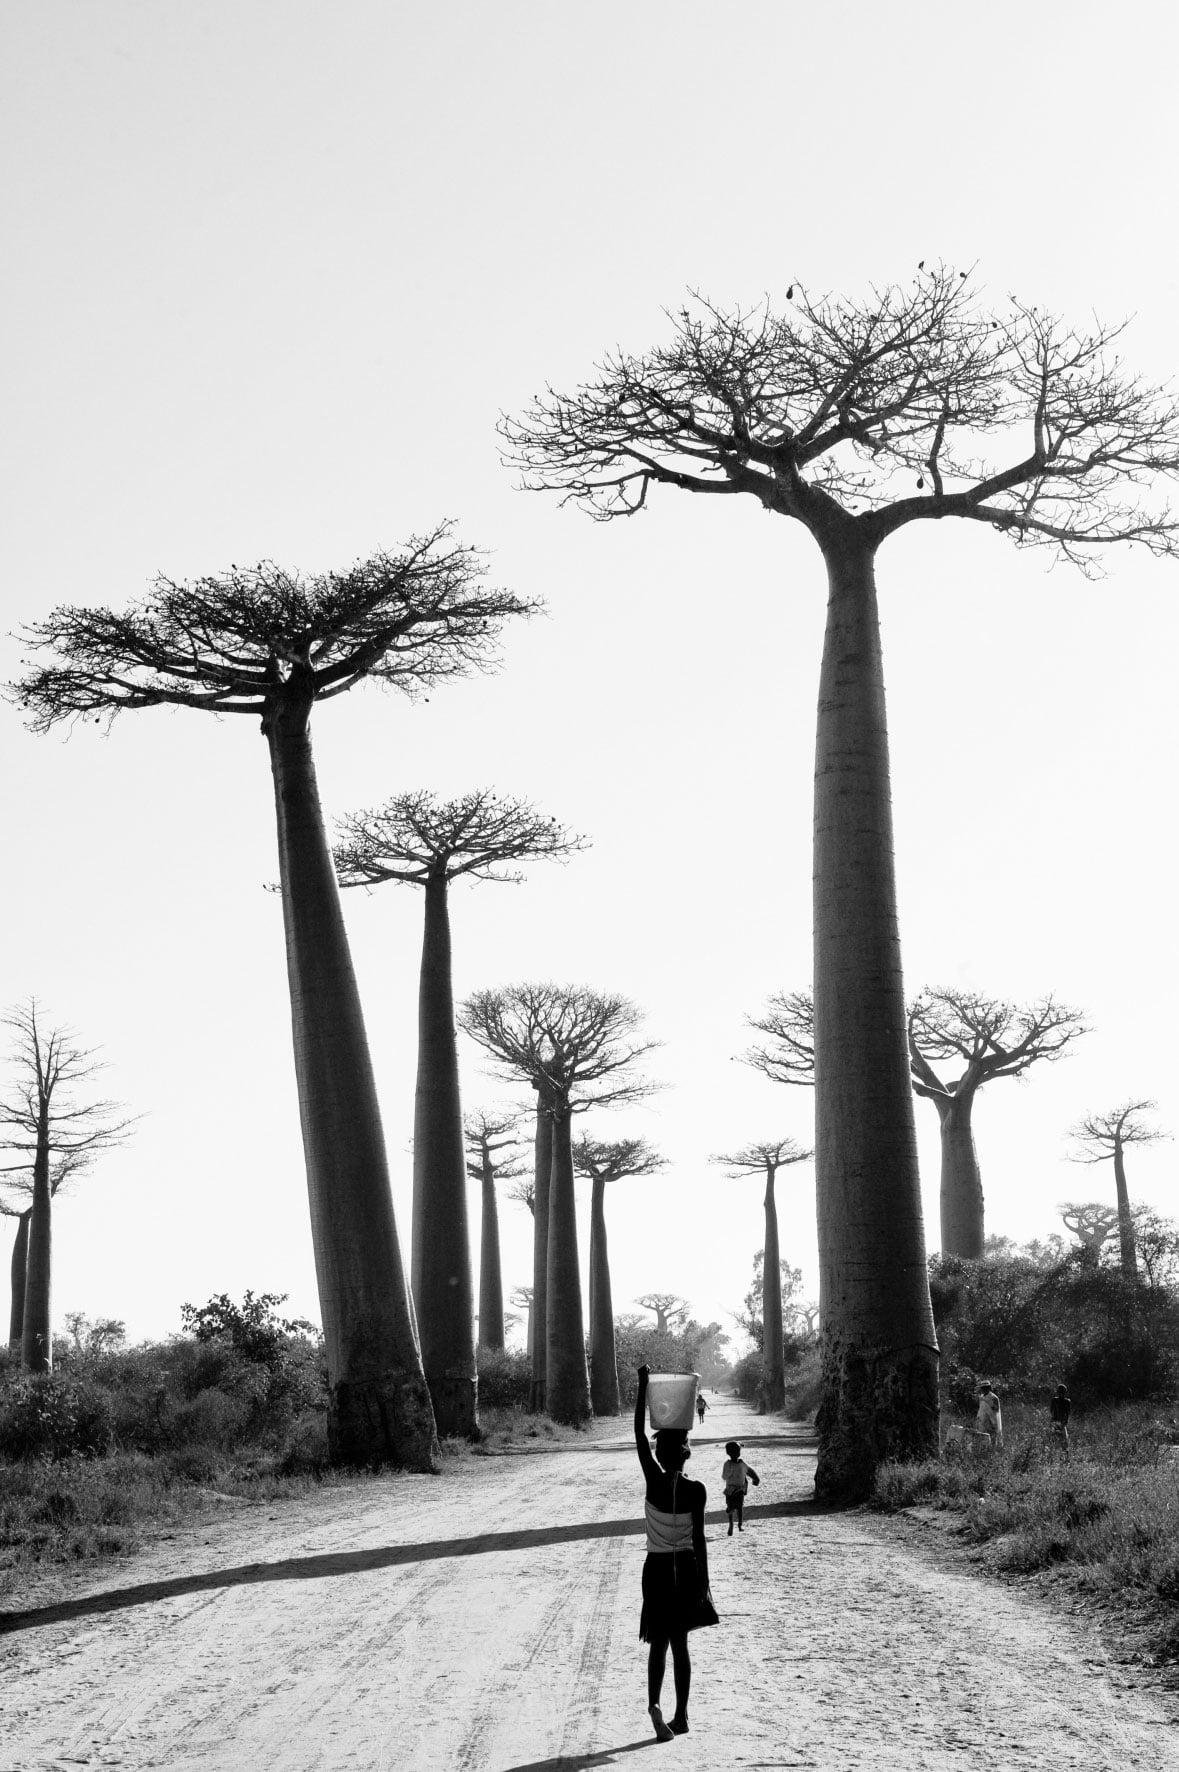 Série-Baobabs-En-avant-Pierrot-Men-Galerie-21